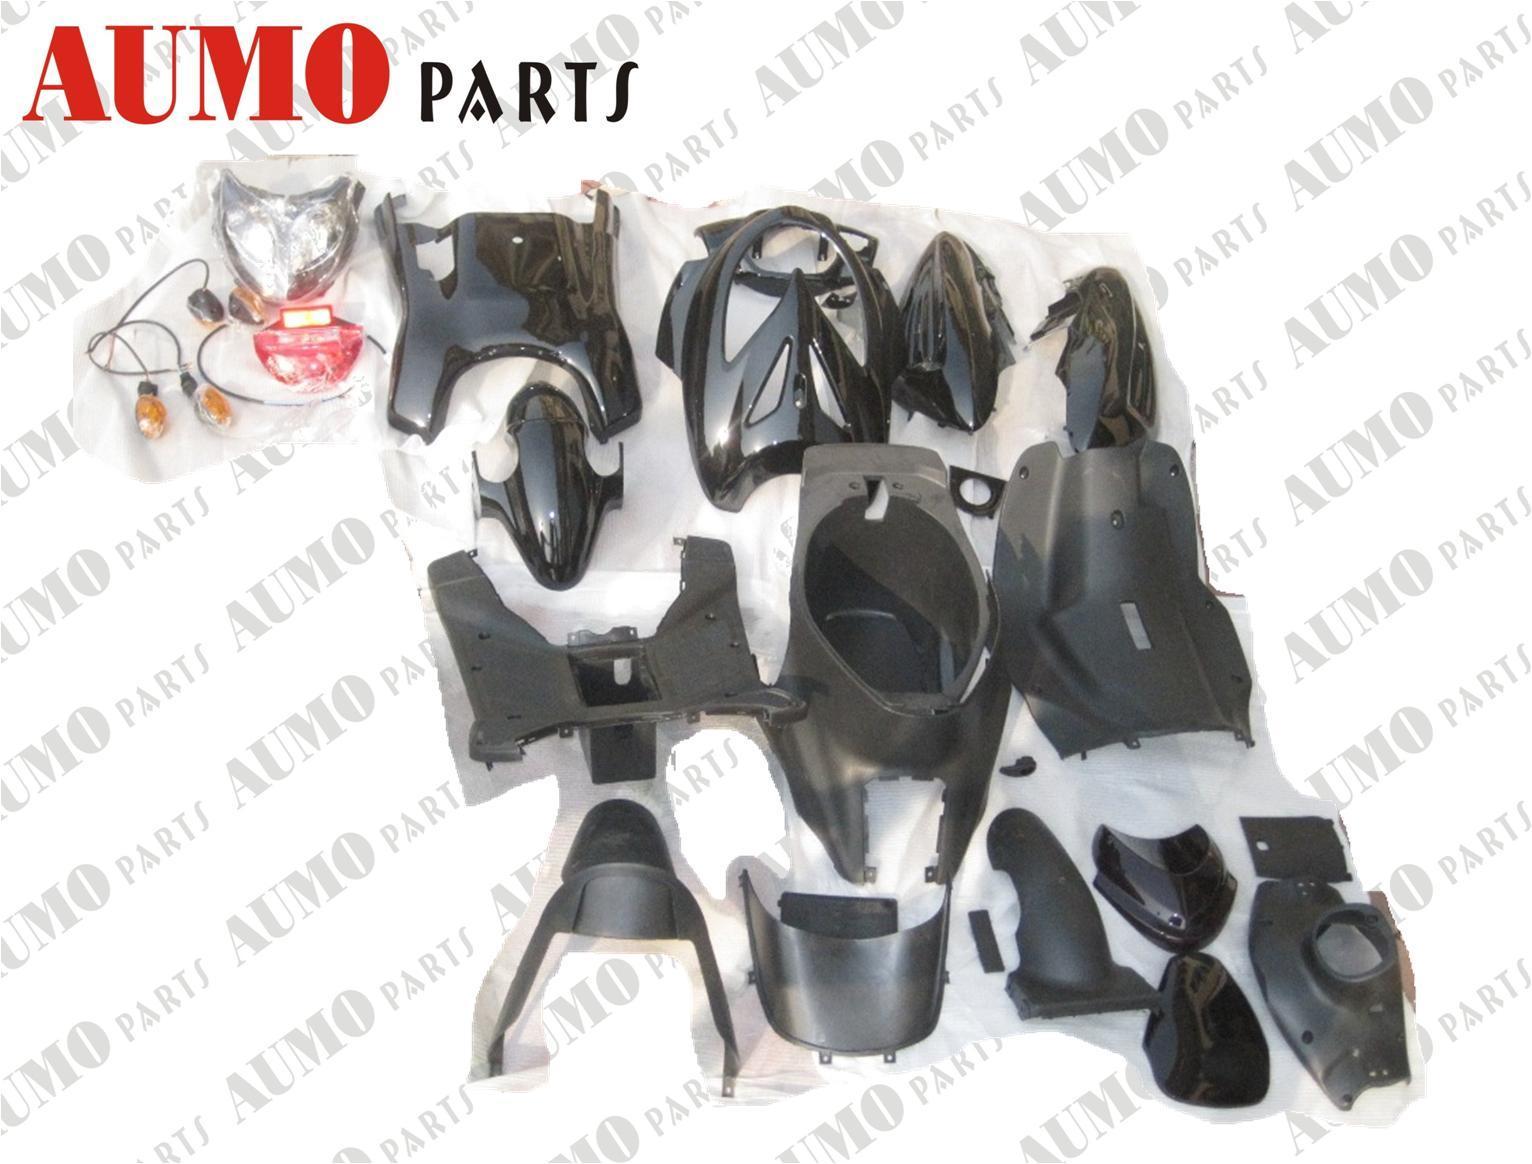 Motorcycle Body Parts, Keeway Plastic Parts (MV020000